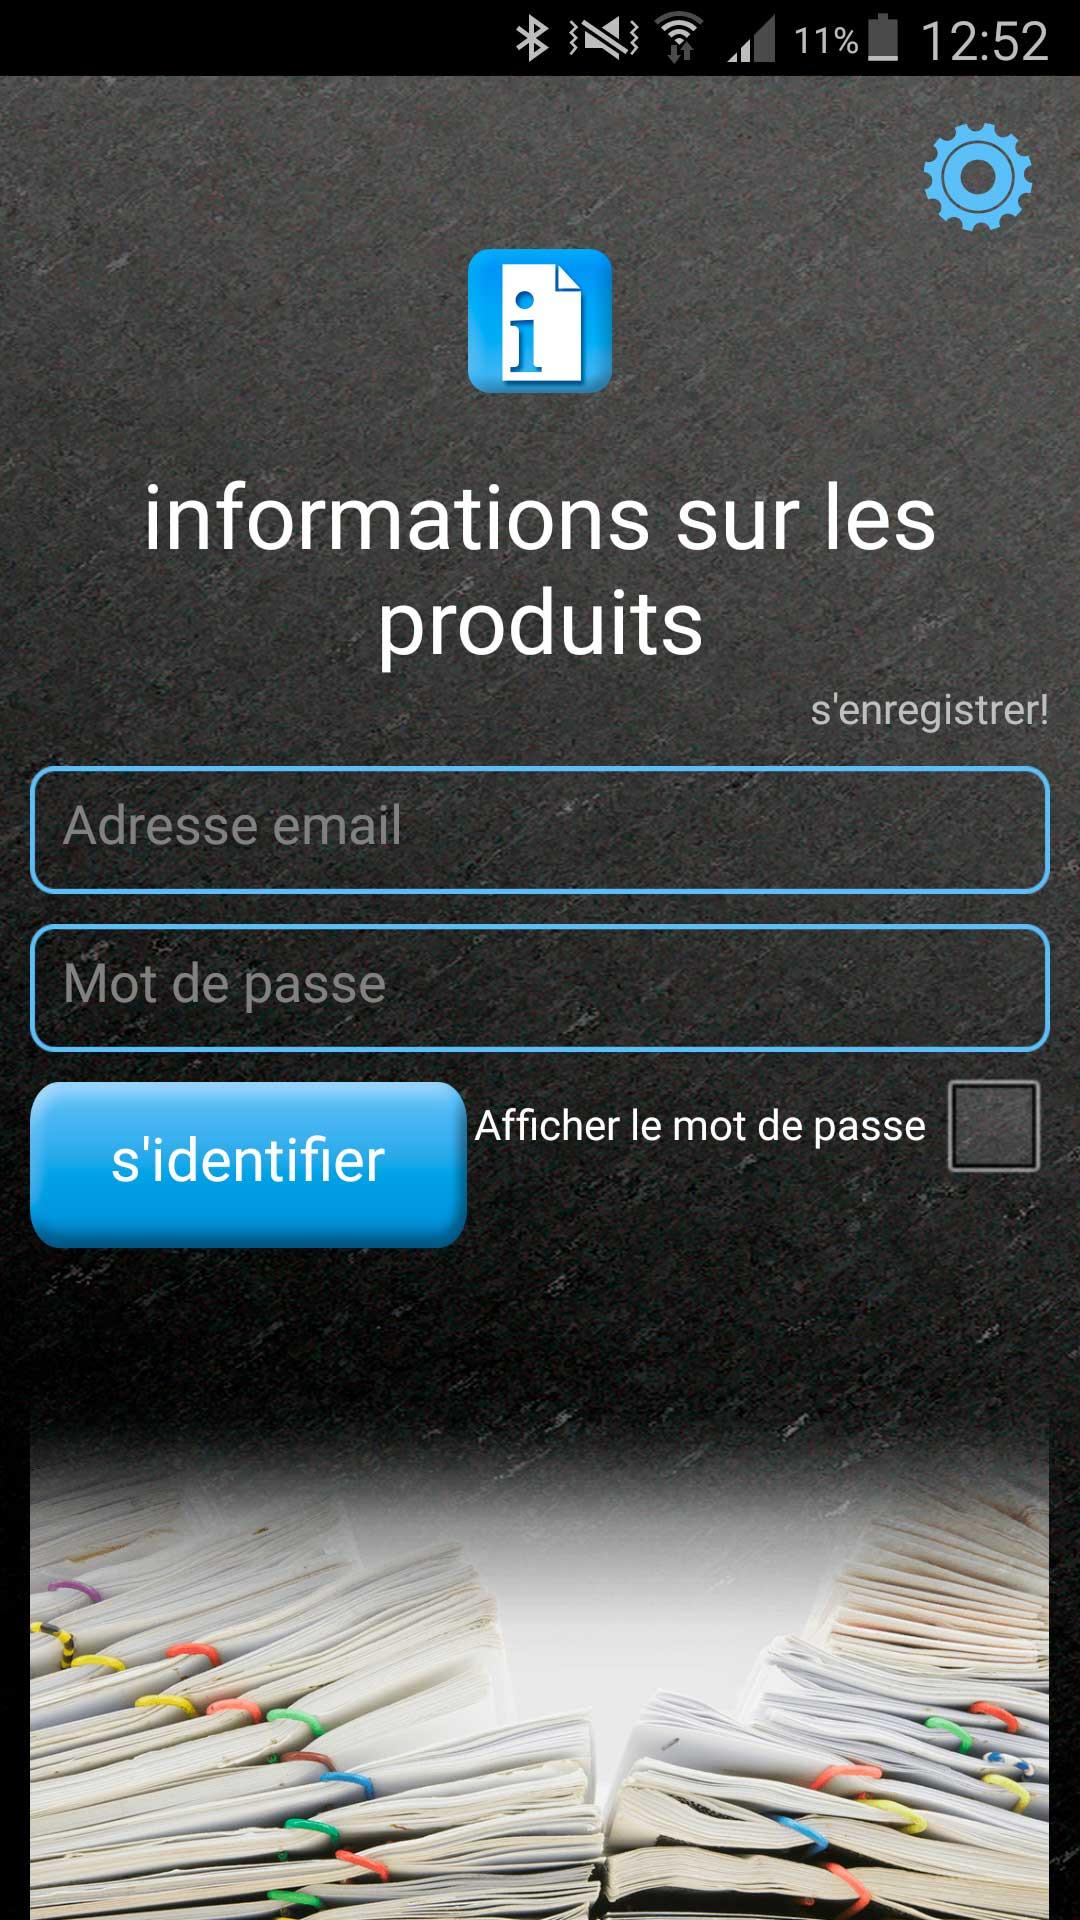 ginstr_app_productInformation_FR_1